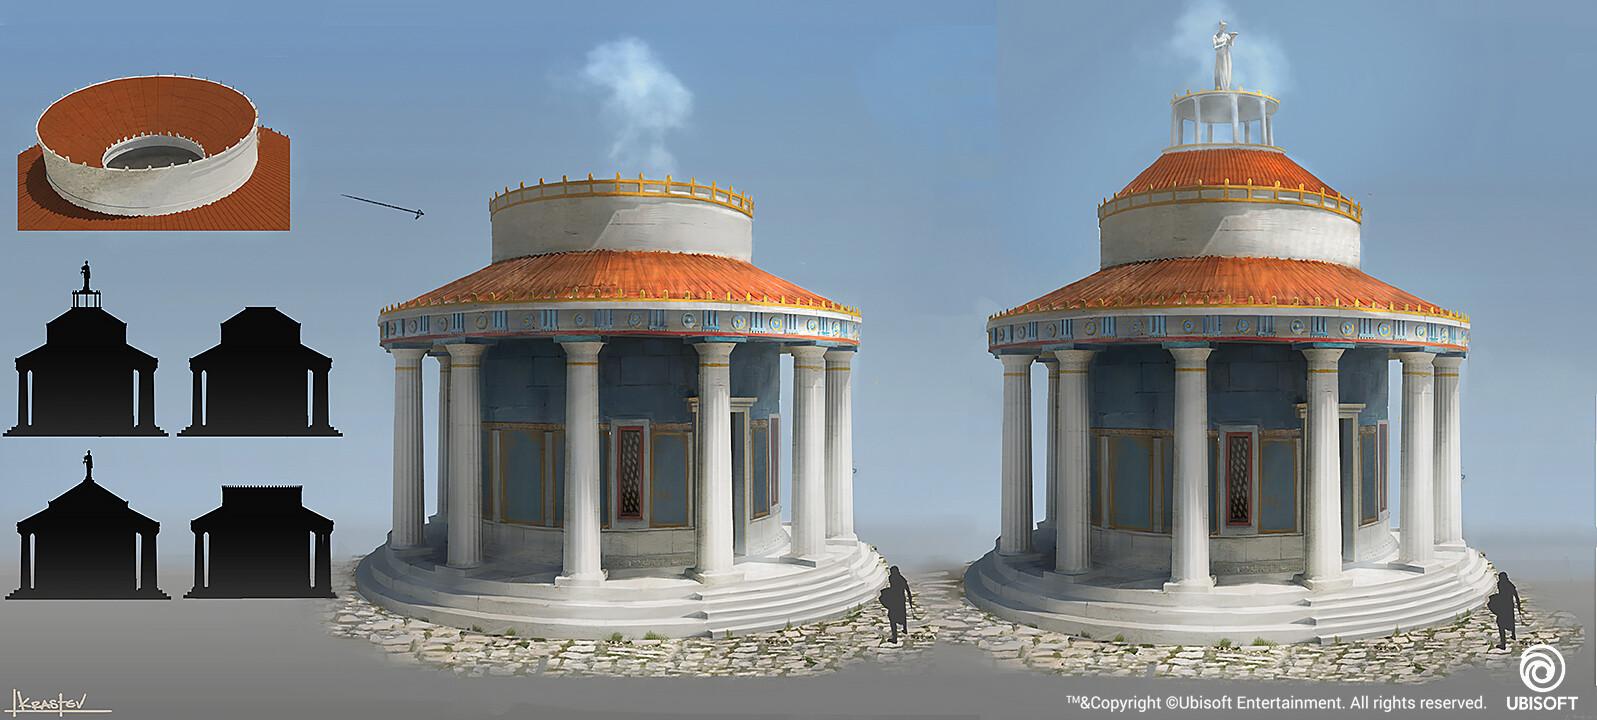 Temple exterior concept